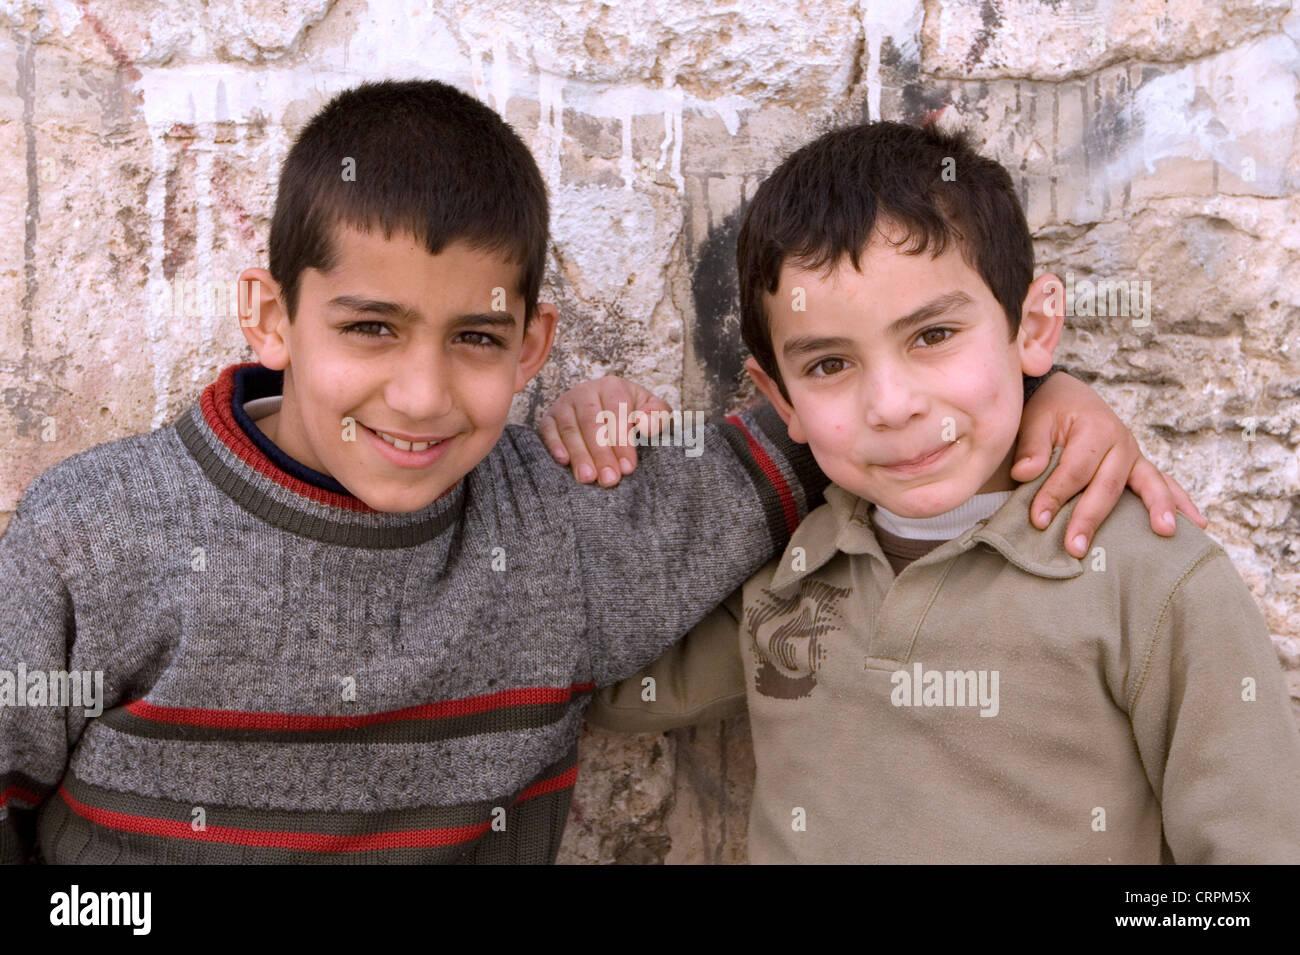 Arab boys in the Old City's Muslim Quarter, Jerusalem, Israel - Stock Image